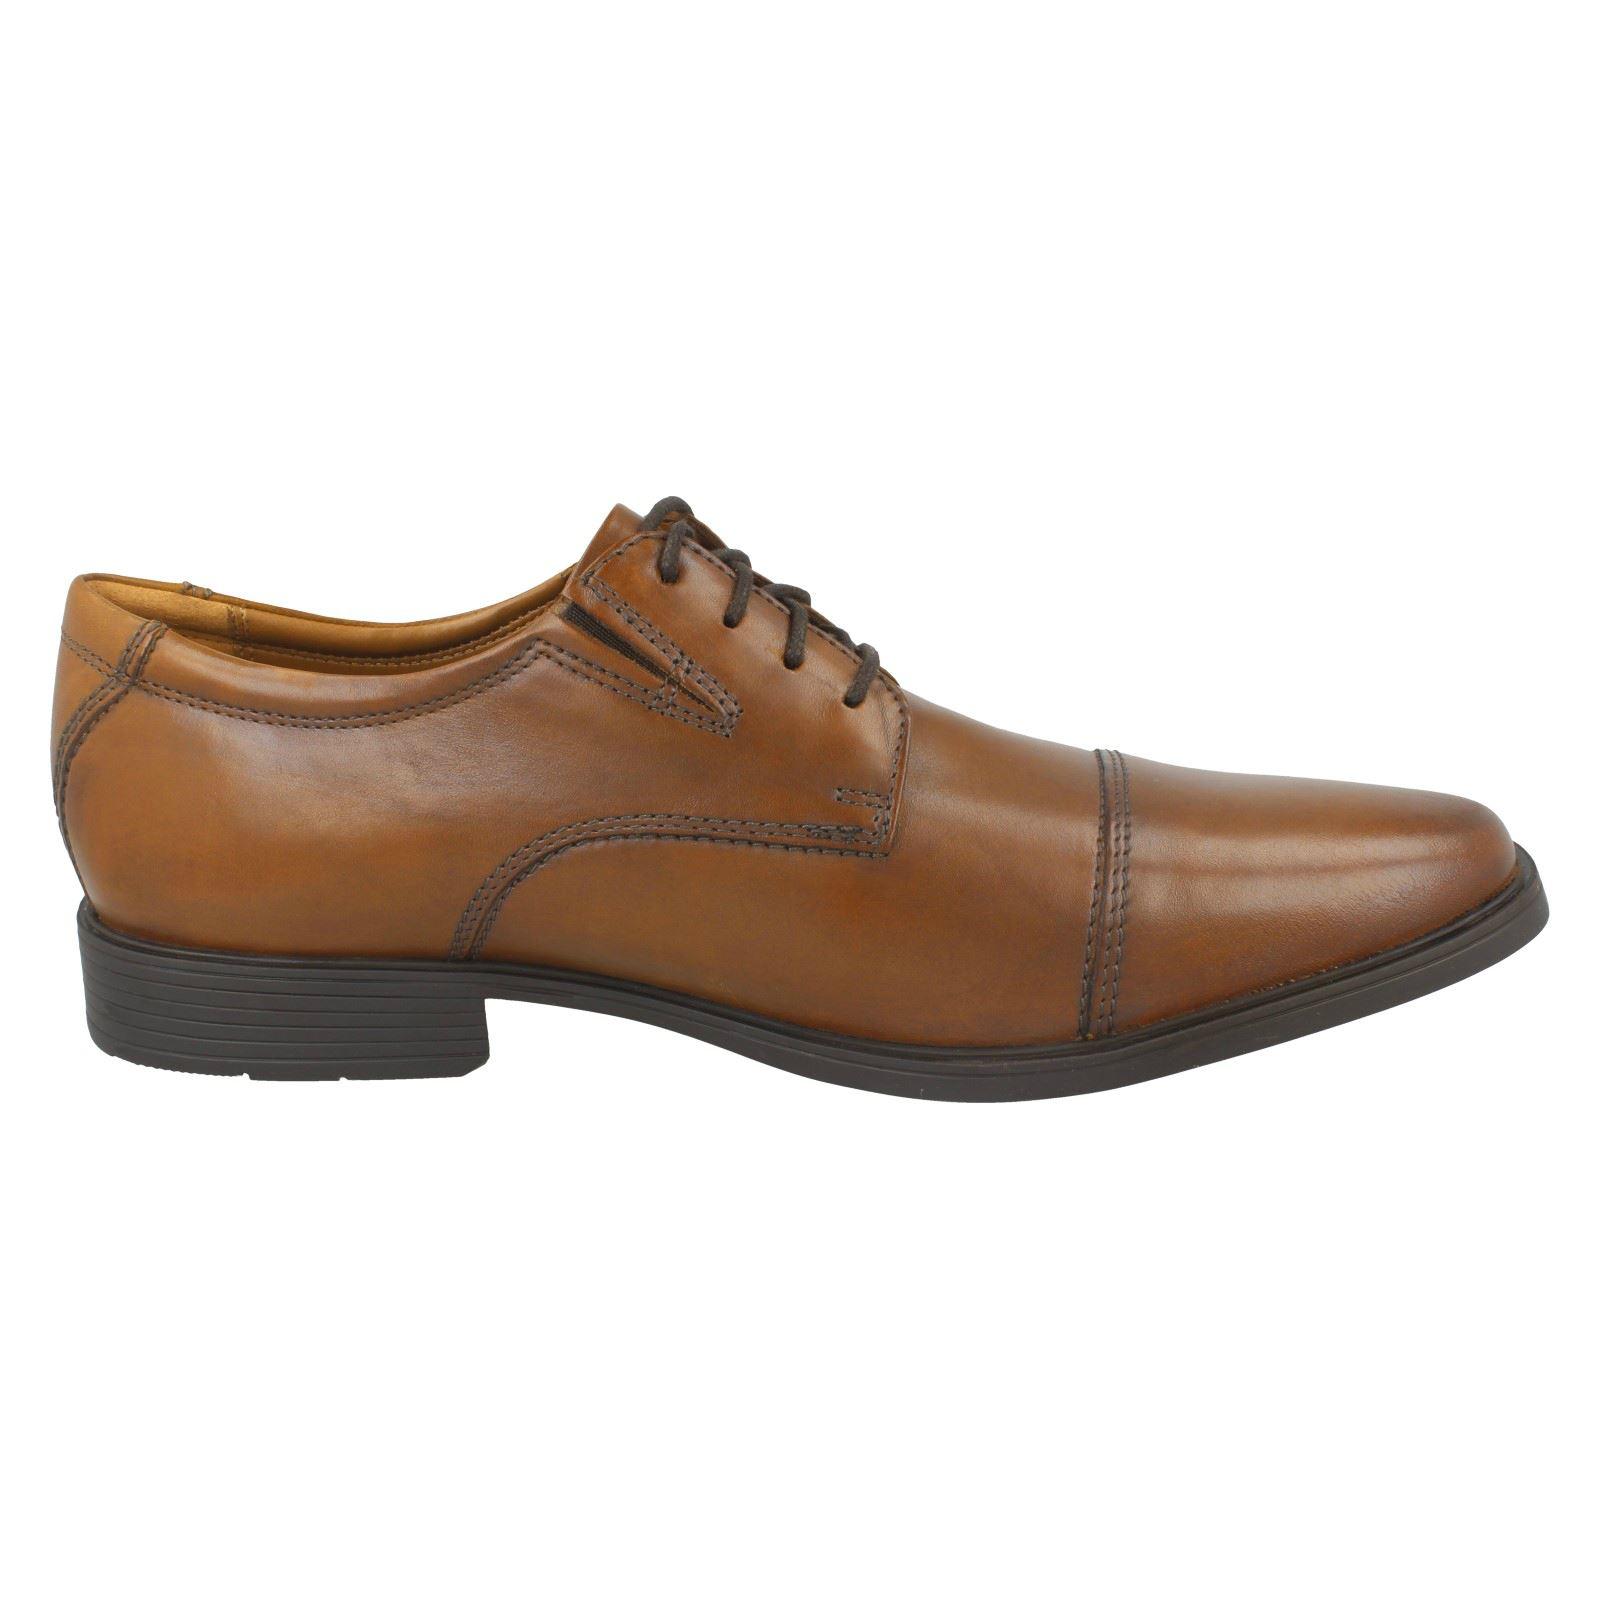 Herren Clarks Formal Lace Up Up Up Schuhes 'Tilden Cap' 59a861